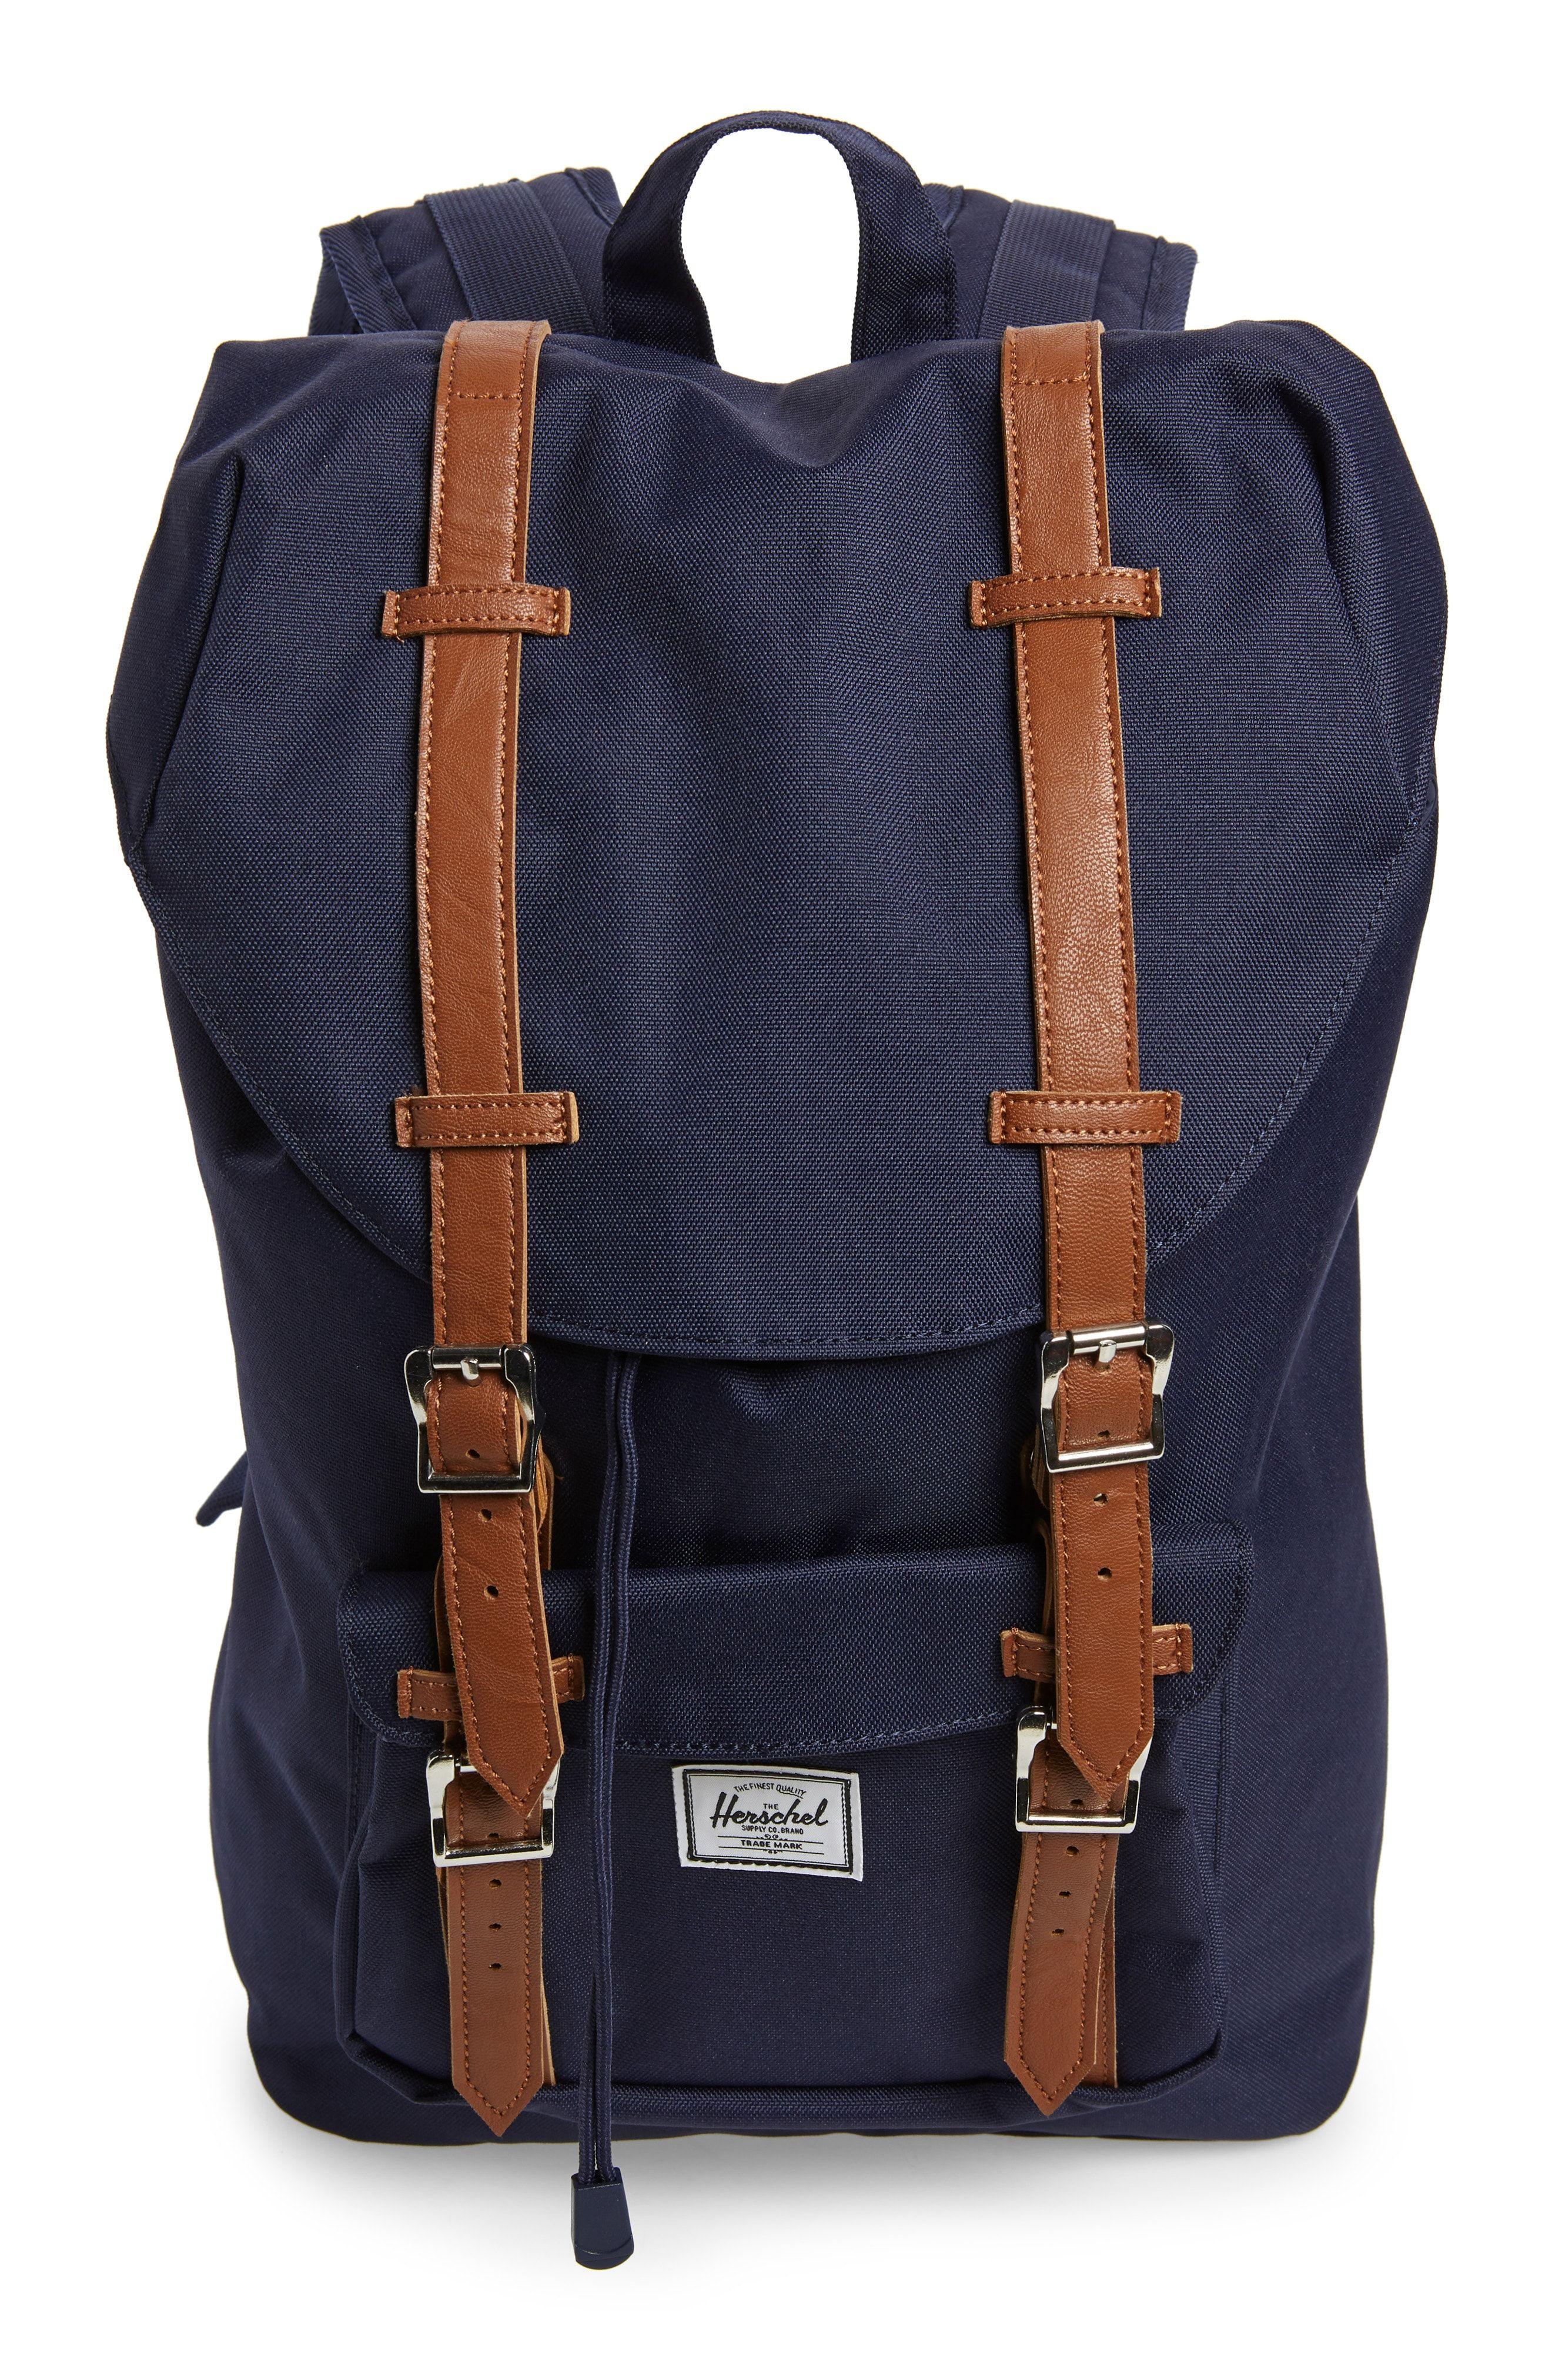 Herschel Supply Co Little America Mid Volume Backpack Blue Herschelsupplyco Bags Backpacks Herschel Supply Co Herschel Accessories